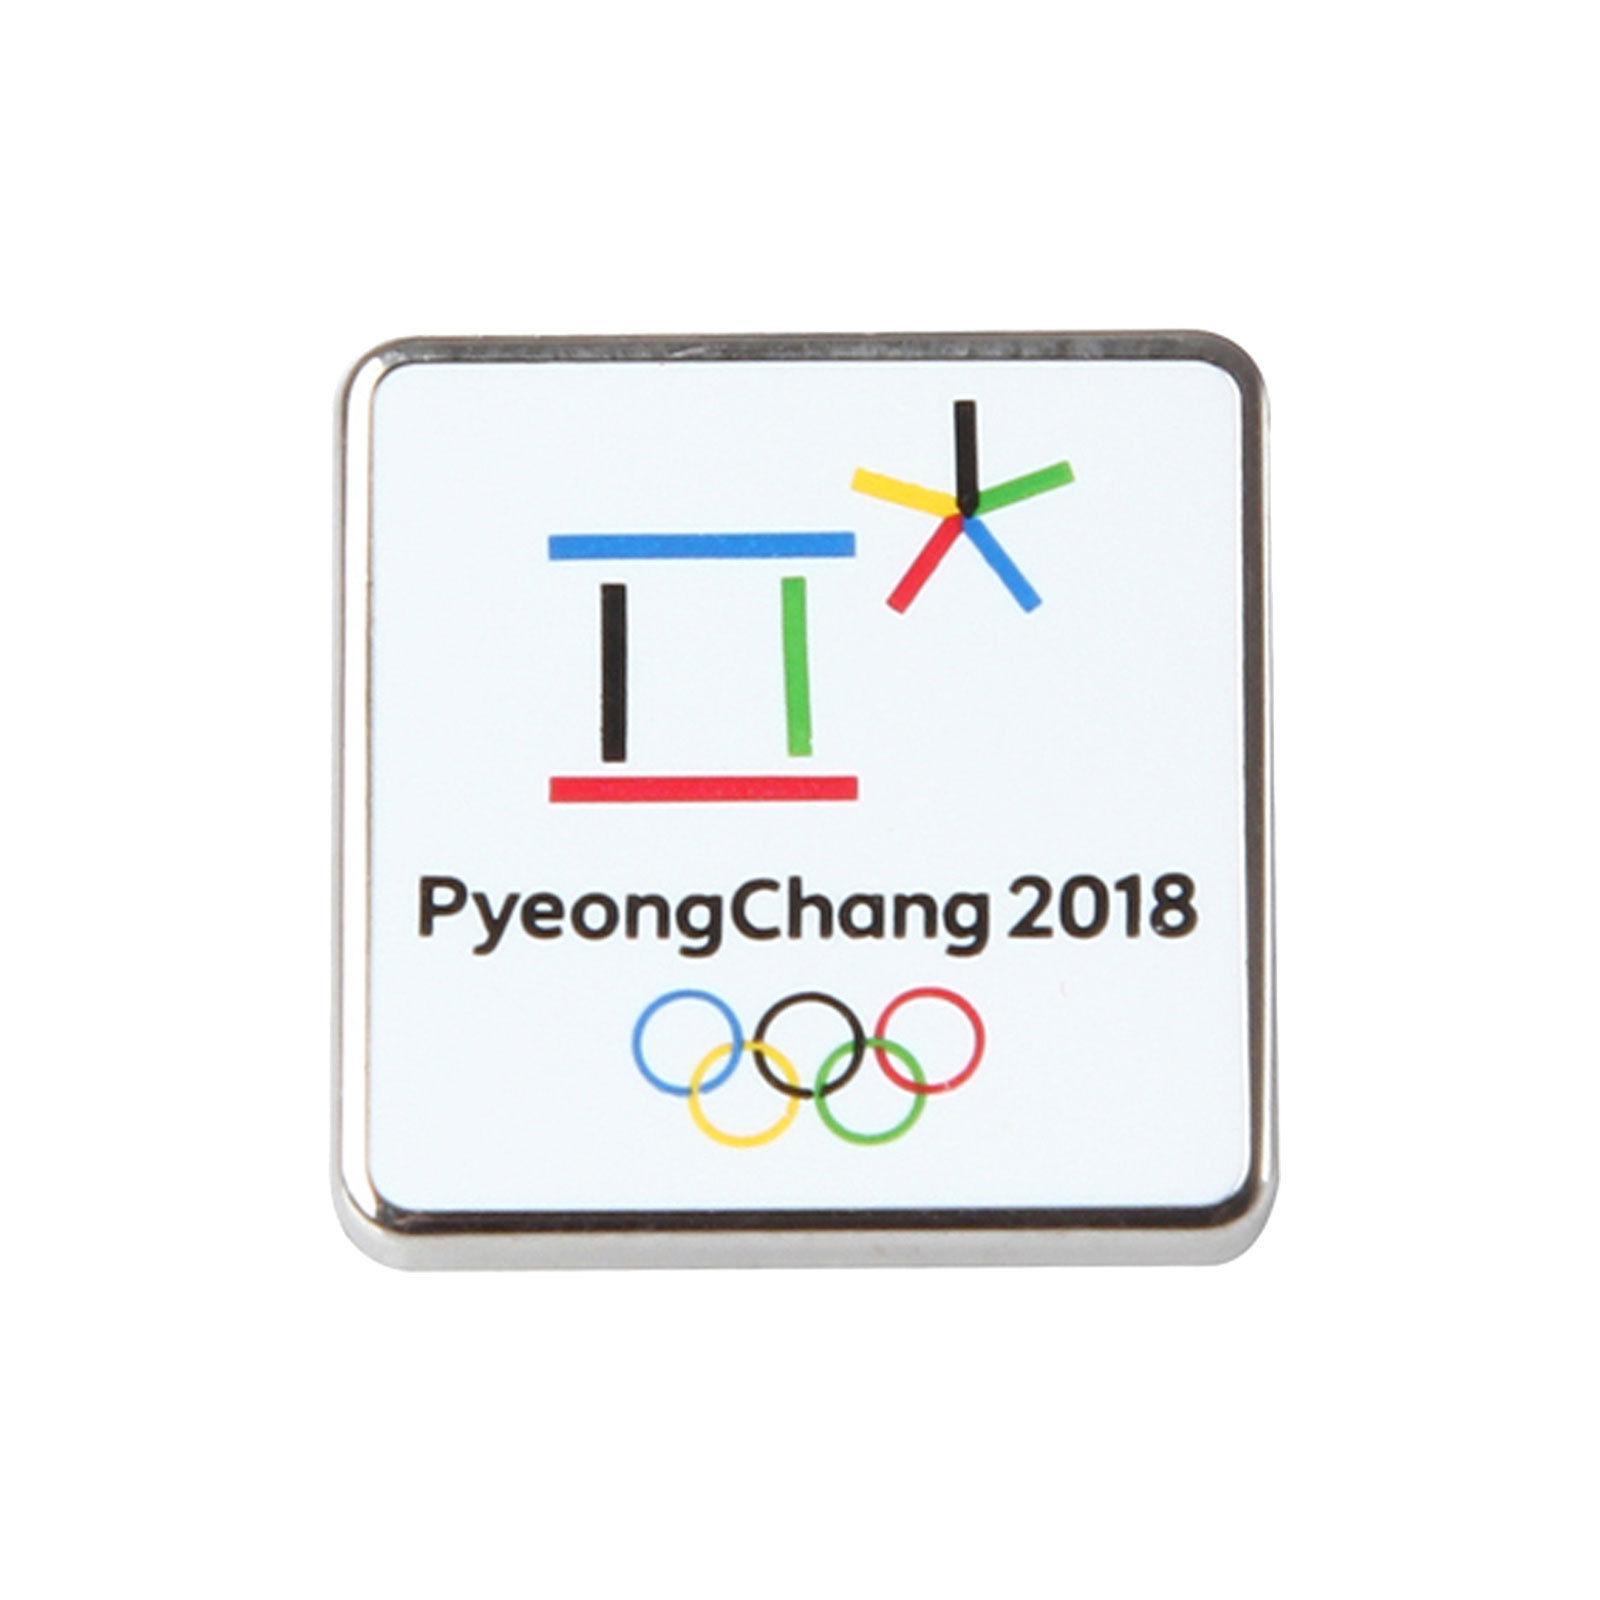 PyeongChang 2018 Korea Winter Olympic Square Badge Pin